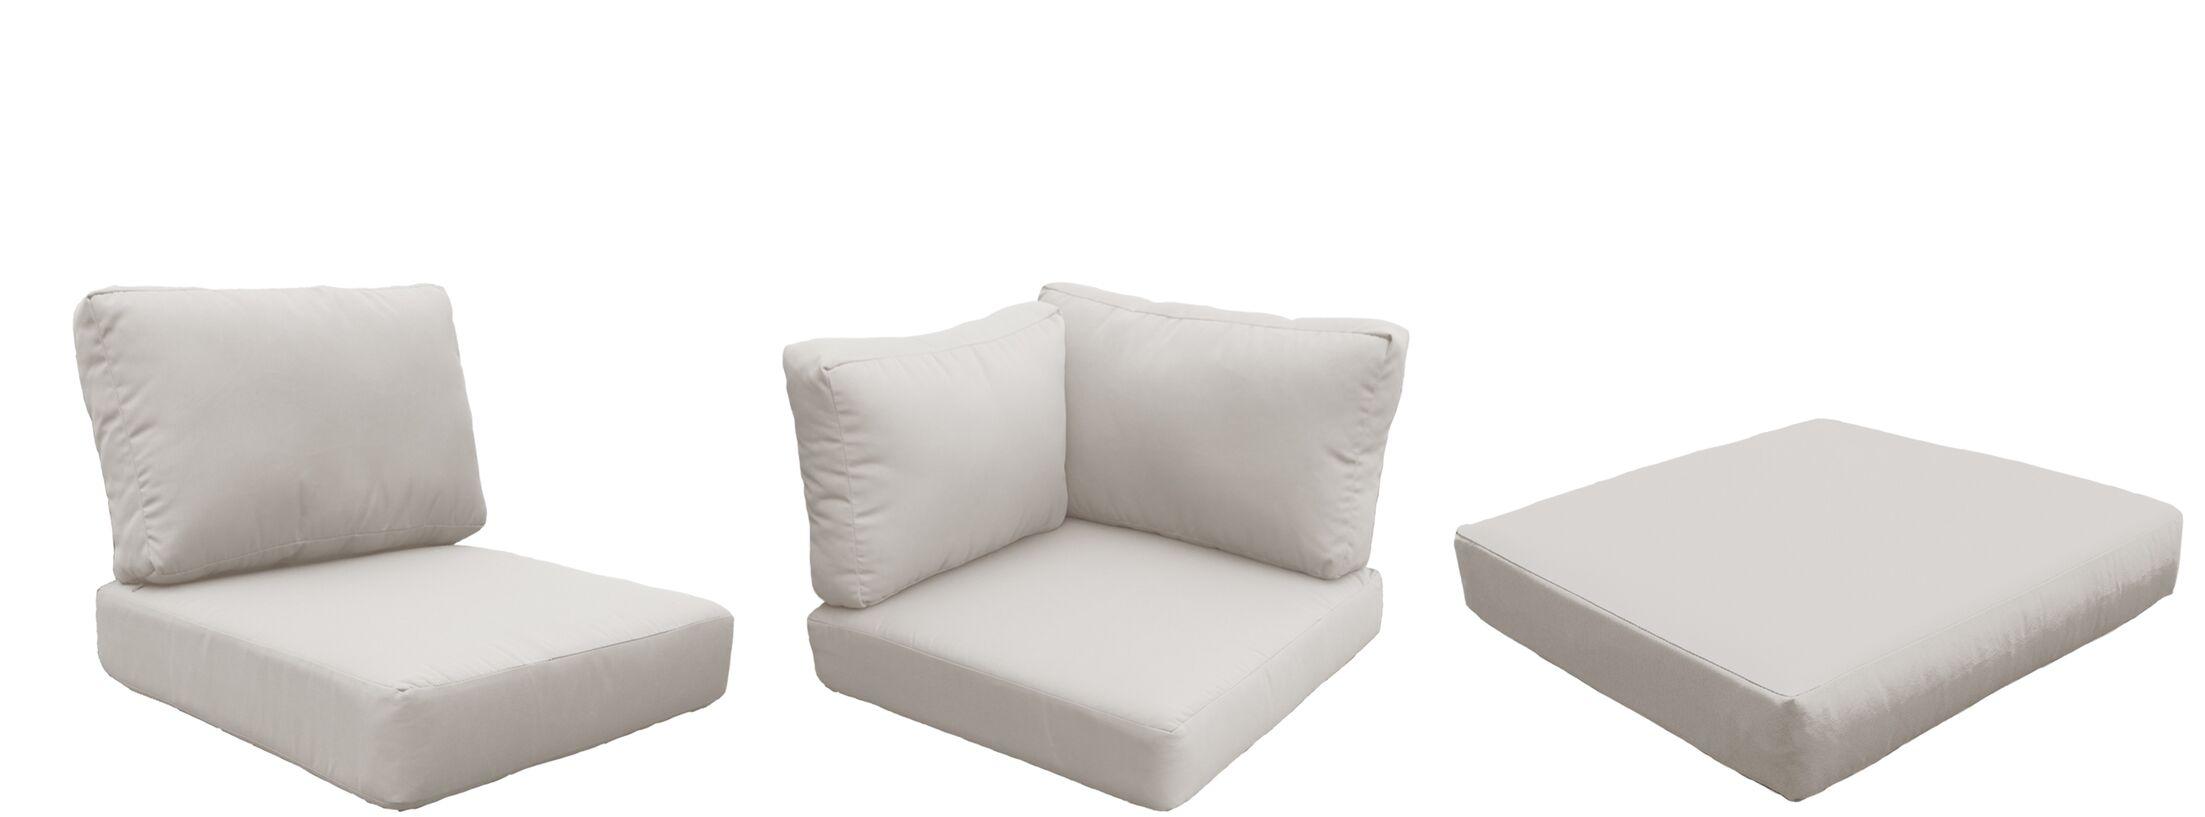 Eldredge Outdoor 18 Piece Lounge Chair Cushion Set Fabric: Beige